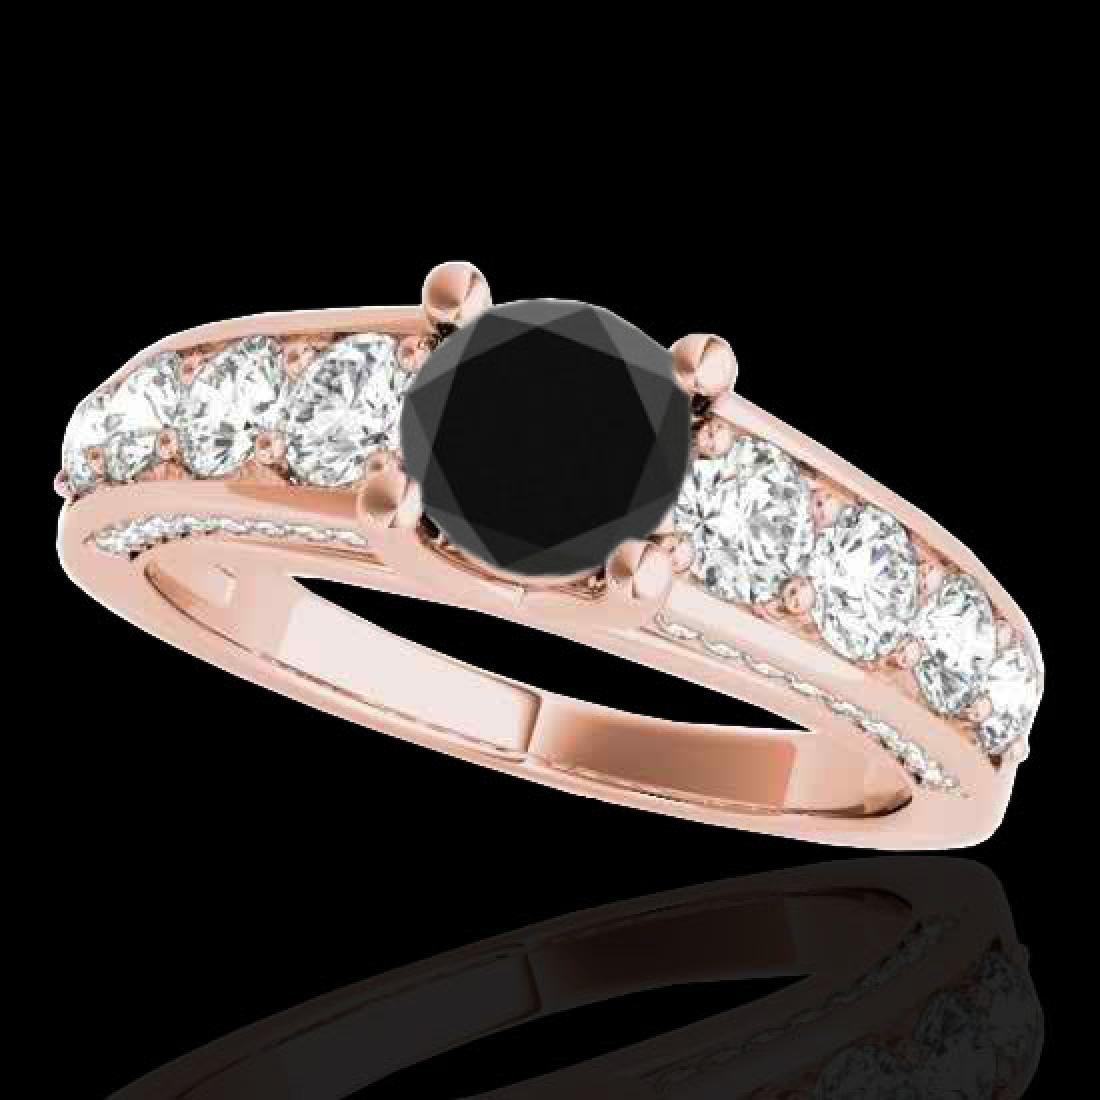 2.55 CTW Certified VS Black Diamond Solitaire Ring 10K